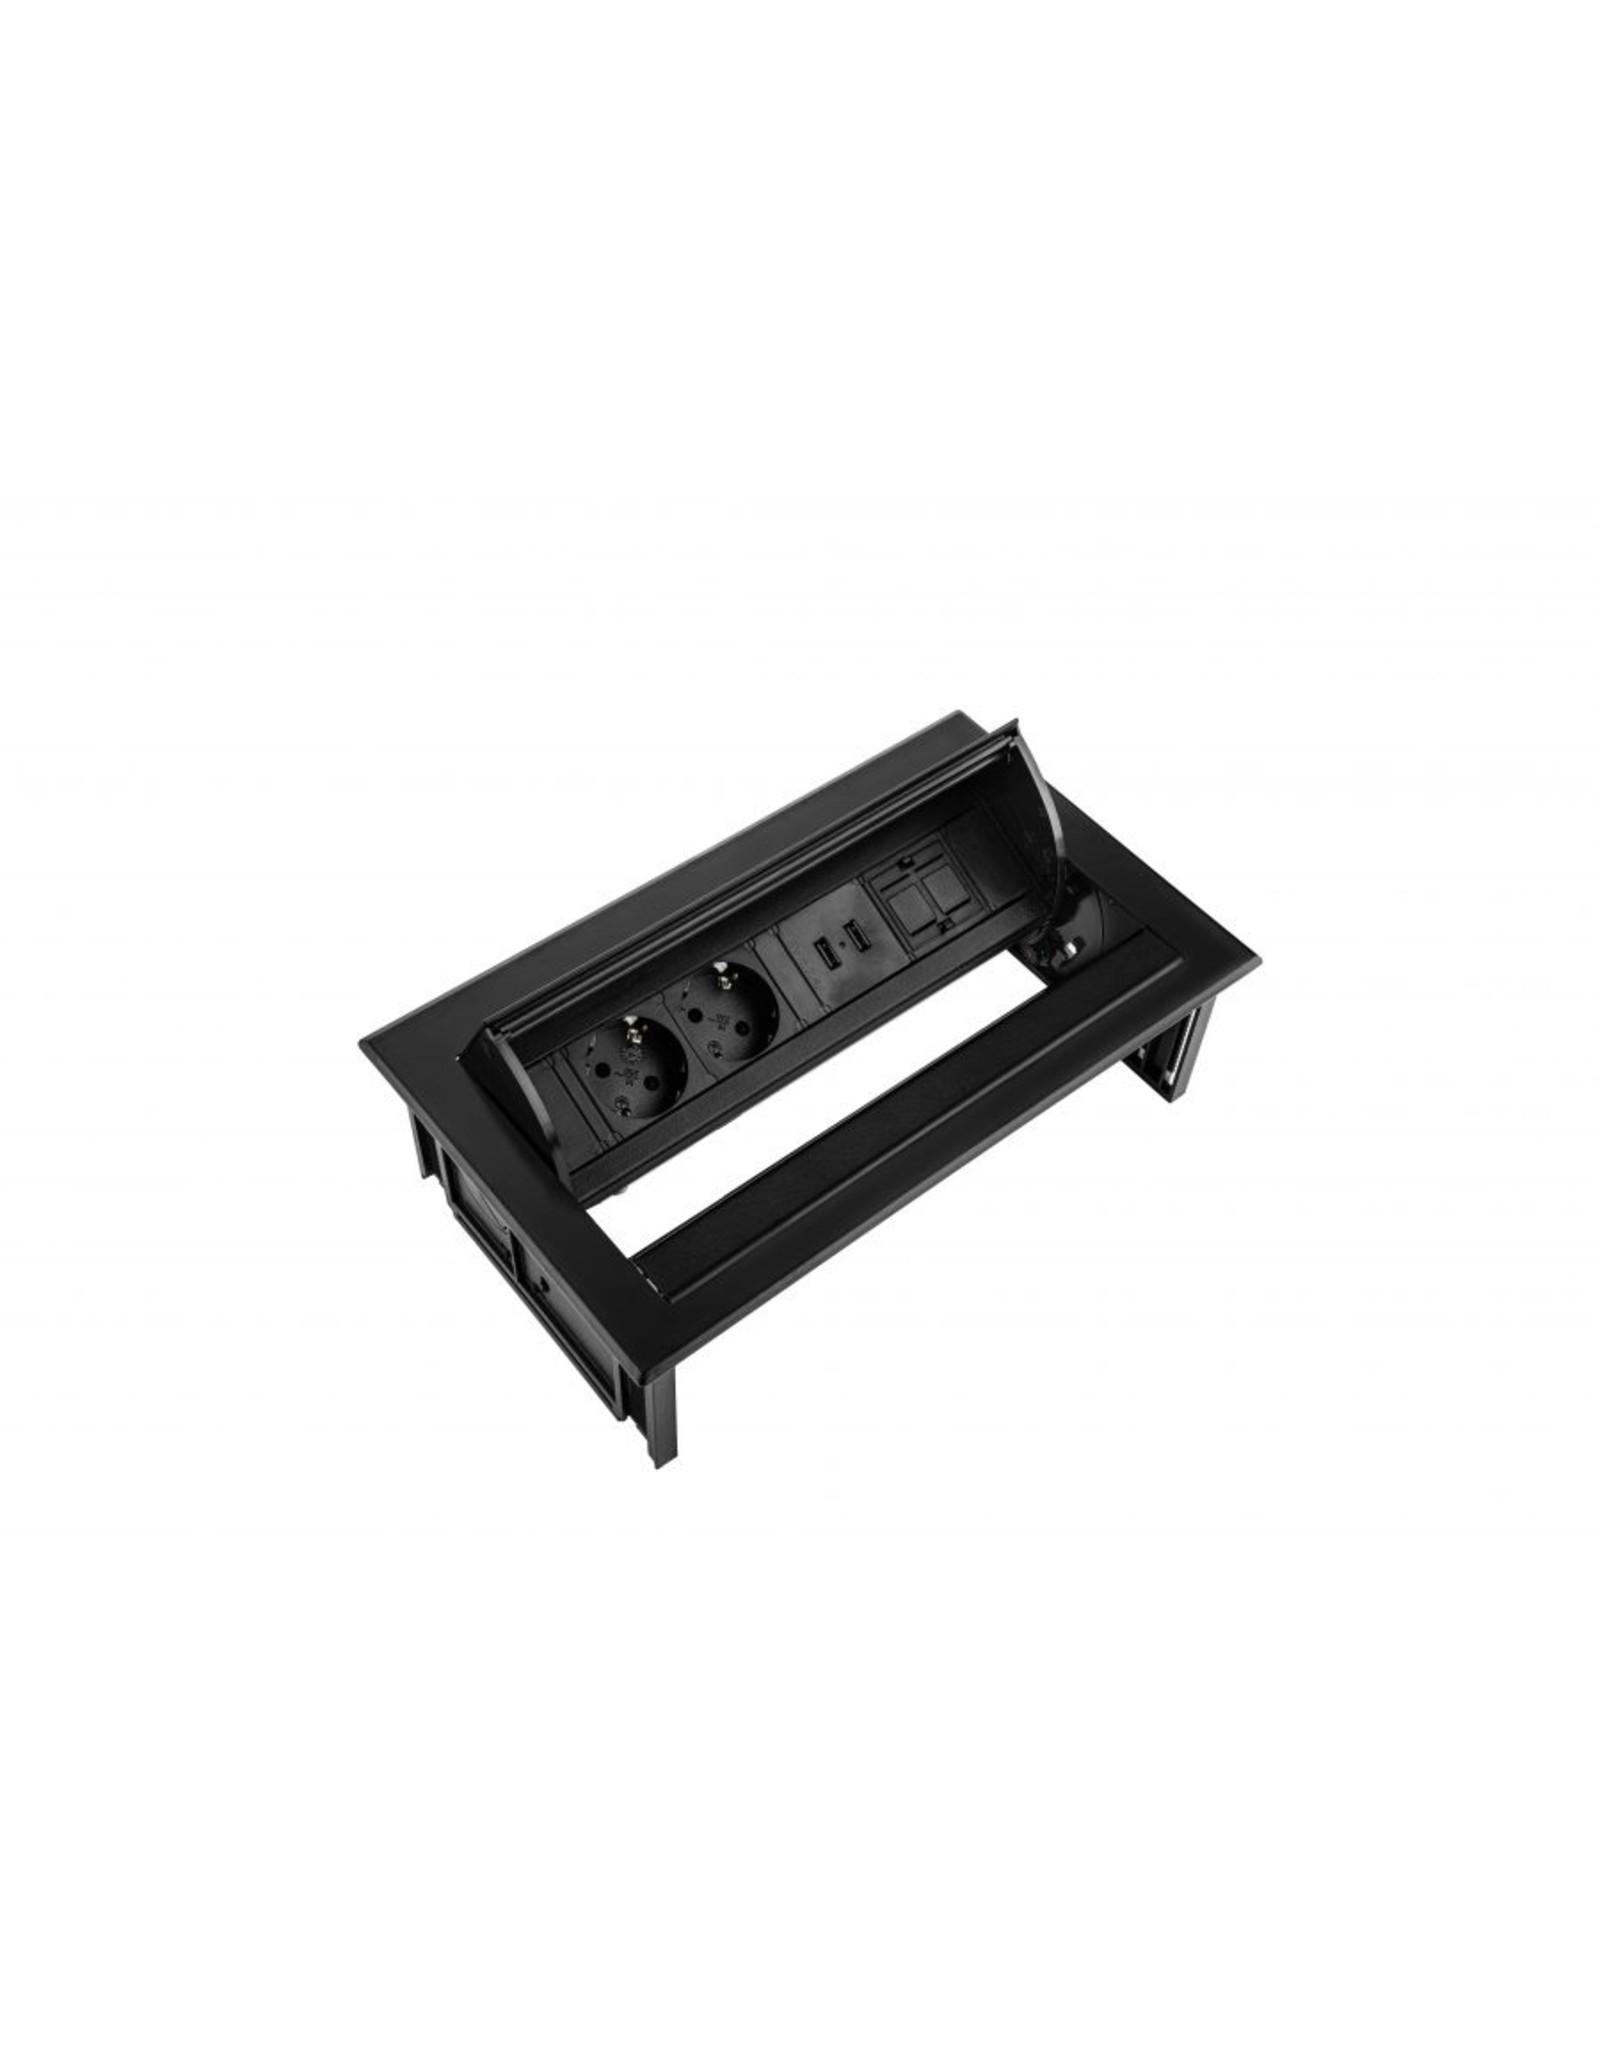 Filex Power Desk In - 2x 230V - 2x USB charger -1x Keystone